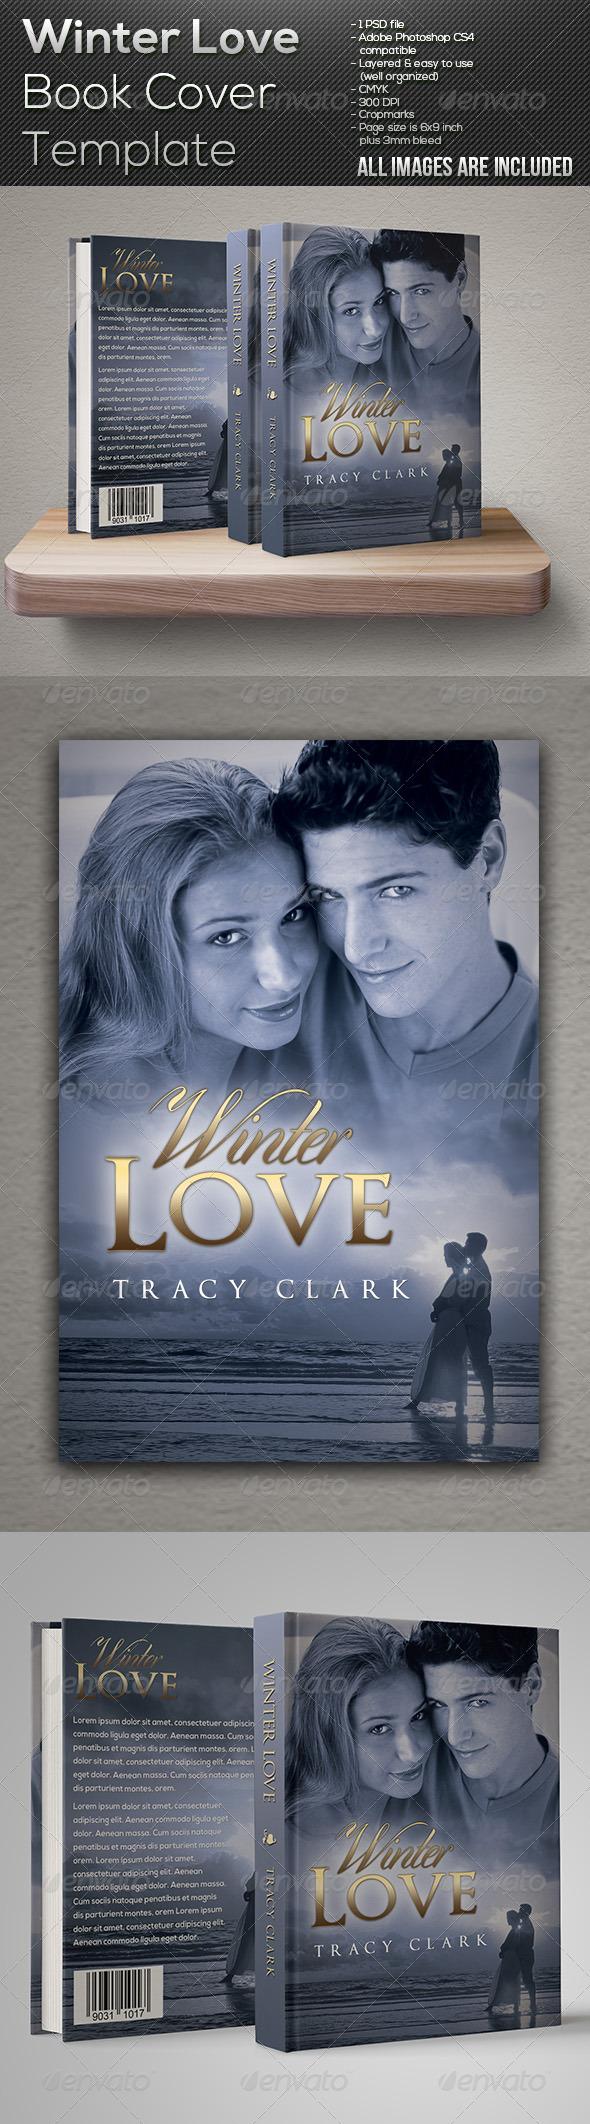 Winter Love Book Cover Template